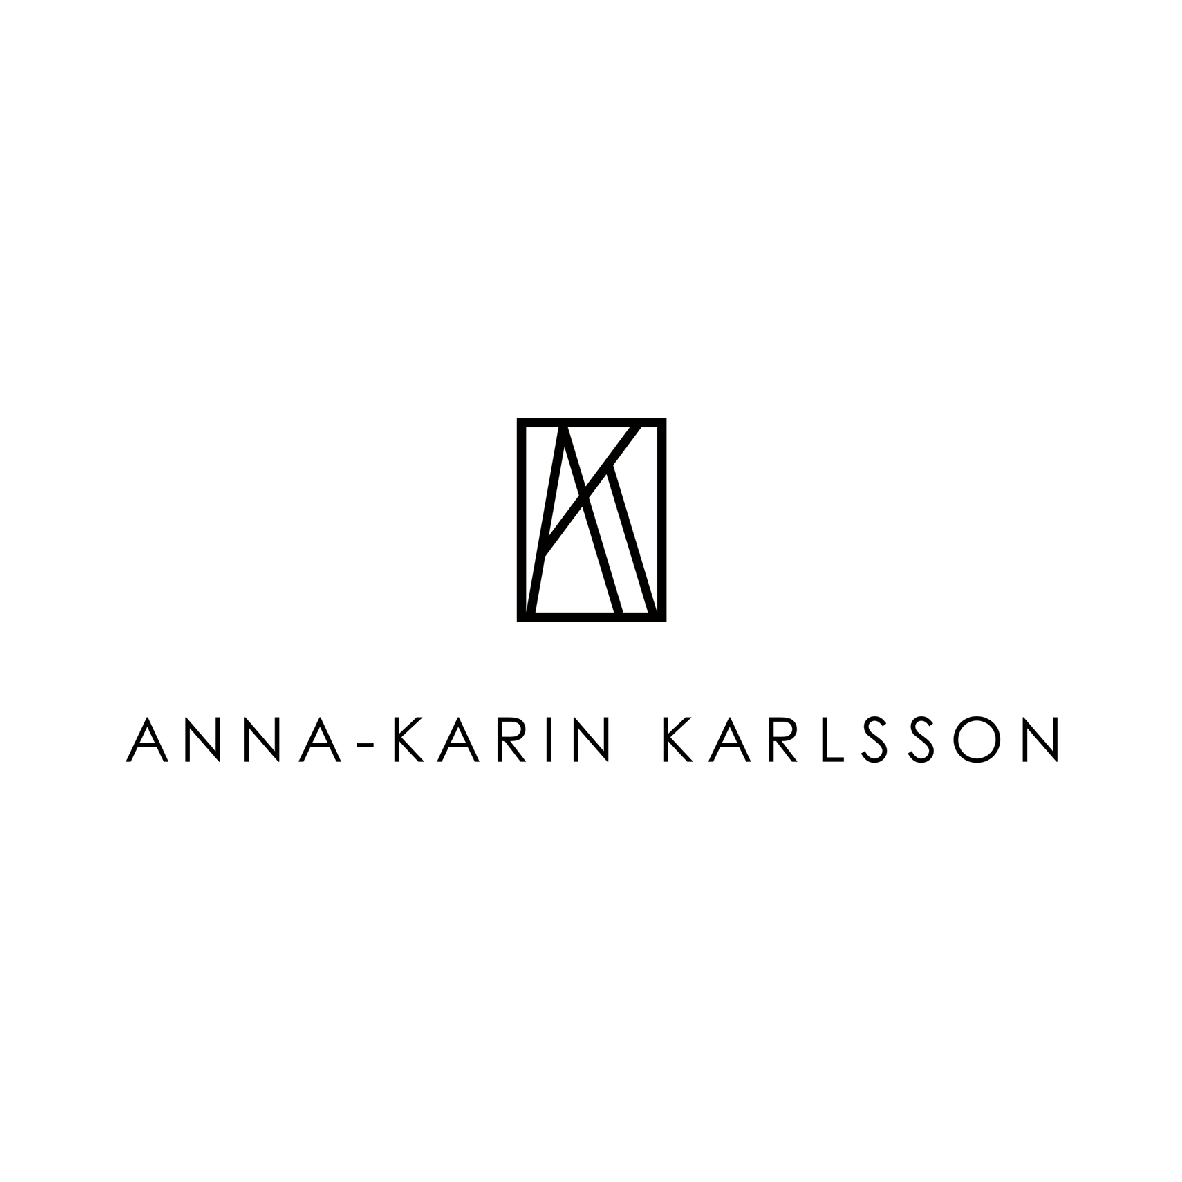 ANNA KARIN KARLSSON